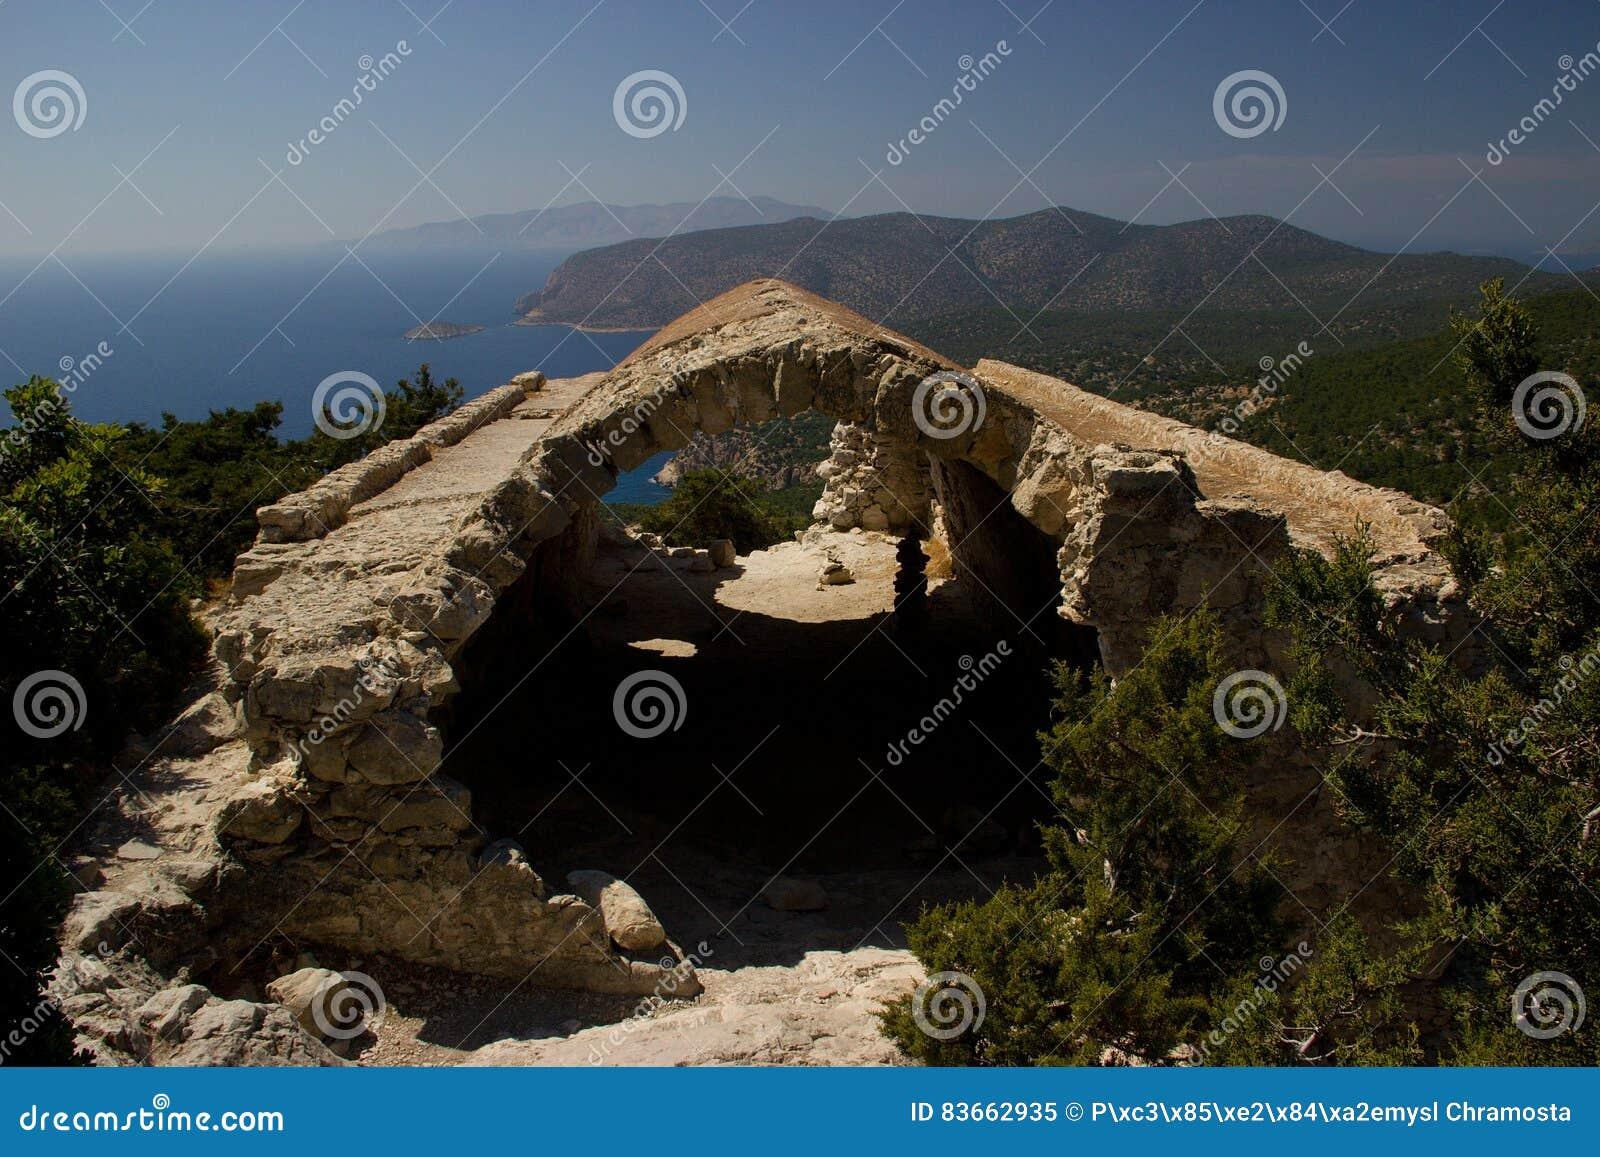 Rhodos Greece historic buildings architecture castle of Monolithos ruins